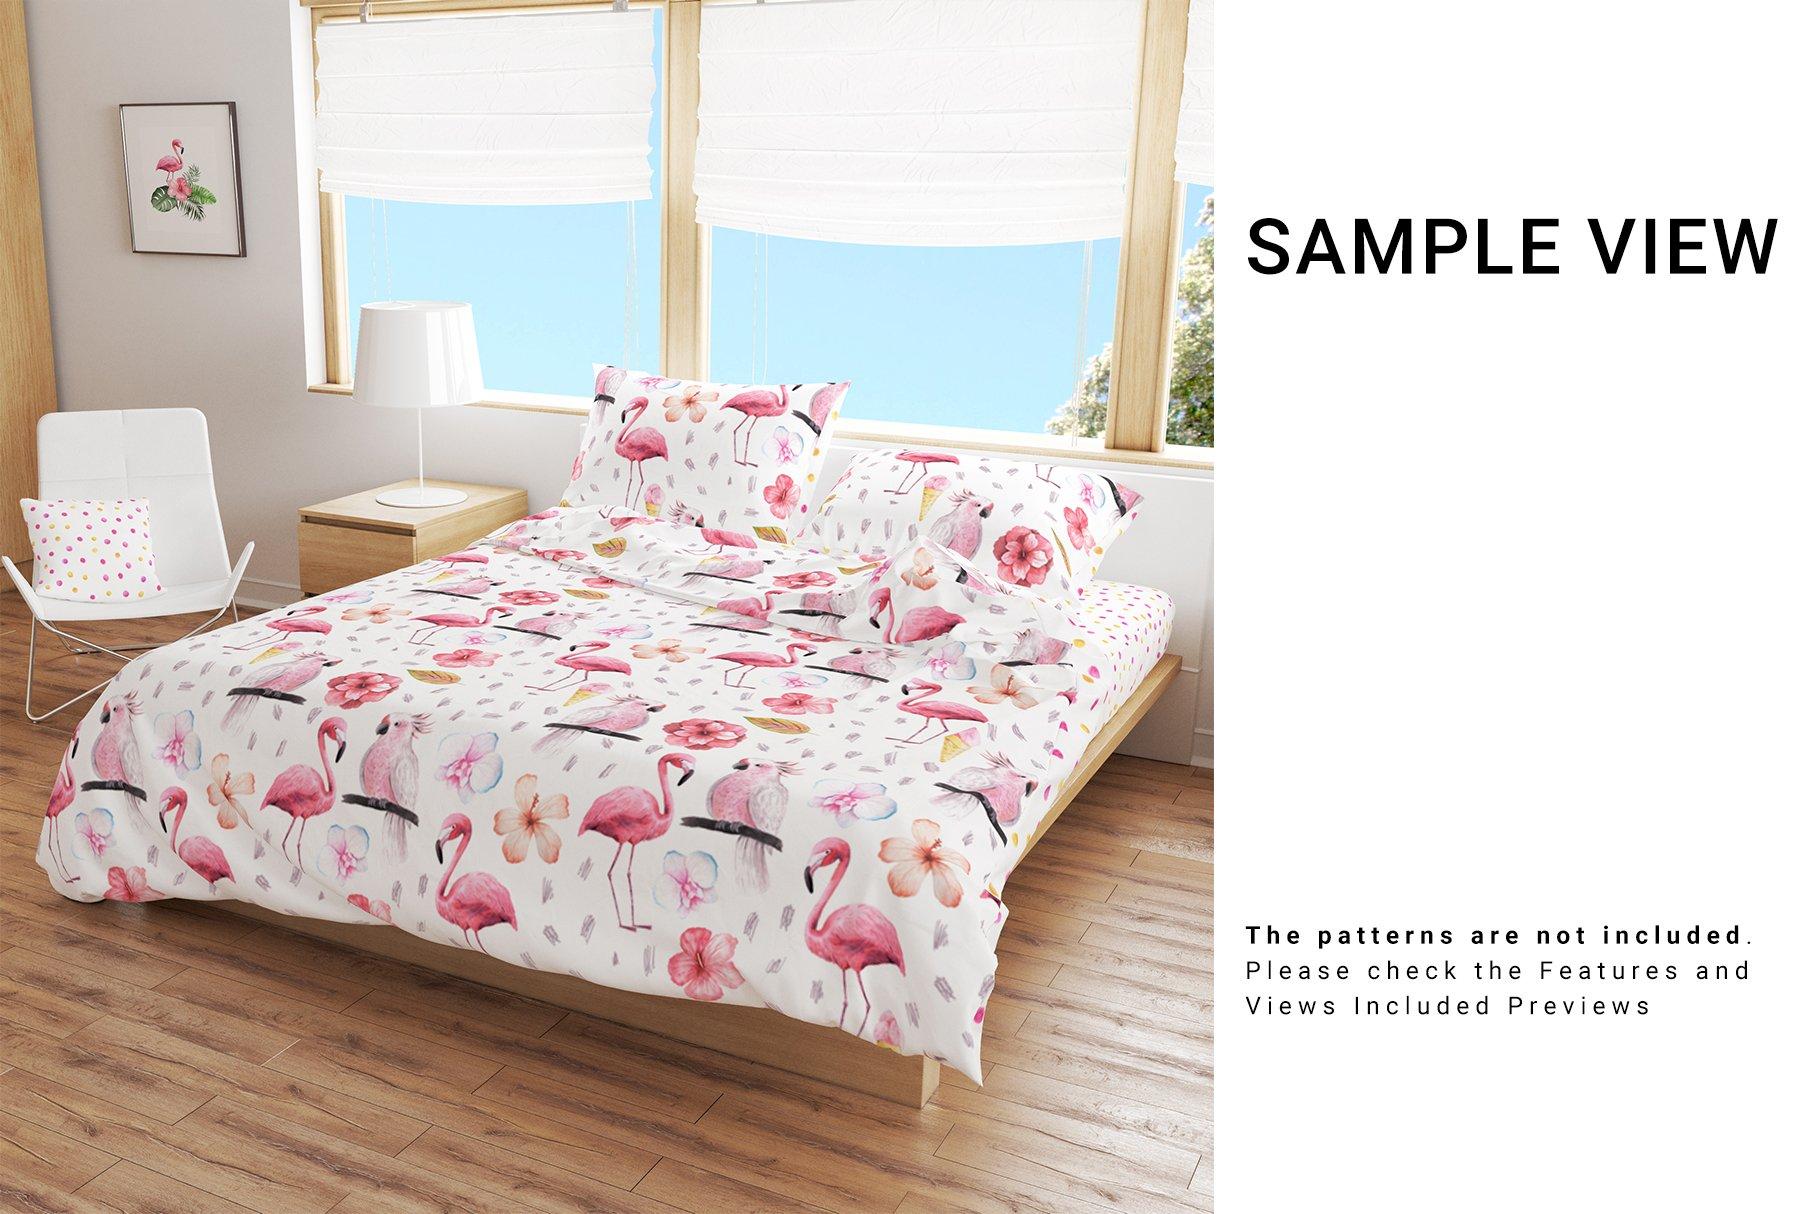 Bedroom Set - Bedding & Throw Pillow example image 9